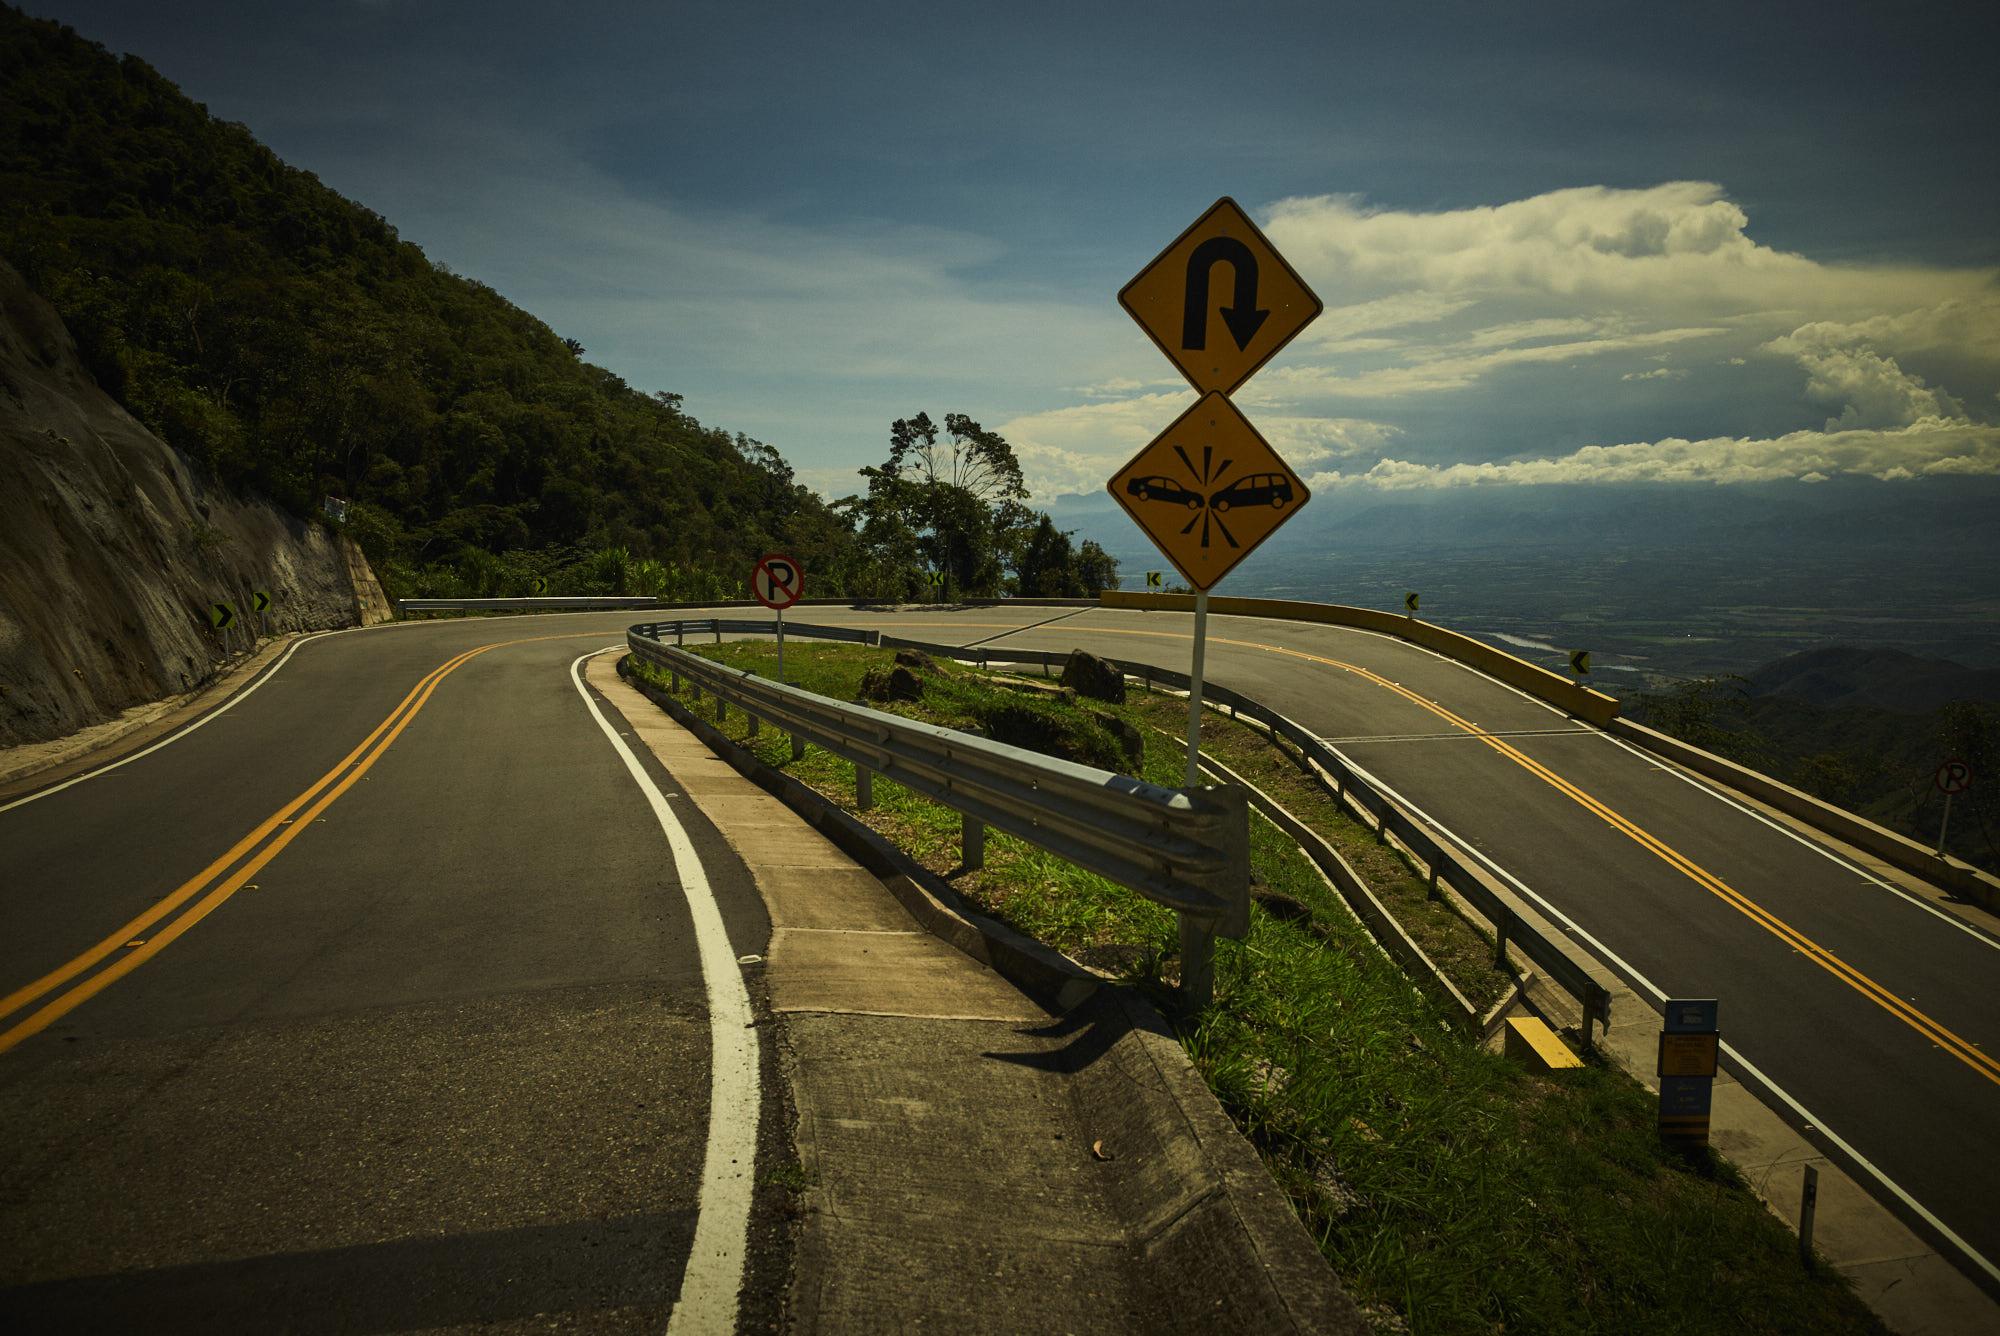 LOWRES-RADRACE-COLUMBIA-2018-CARLOS-1349.jpg